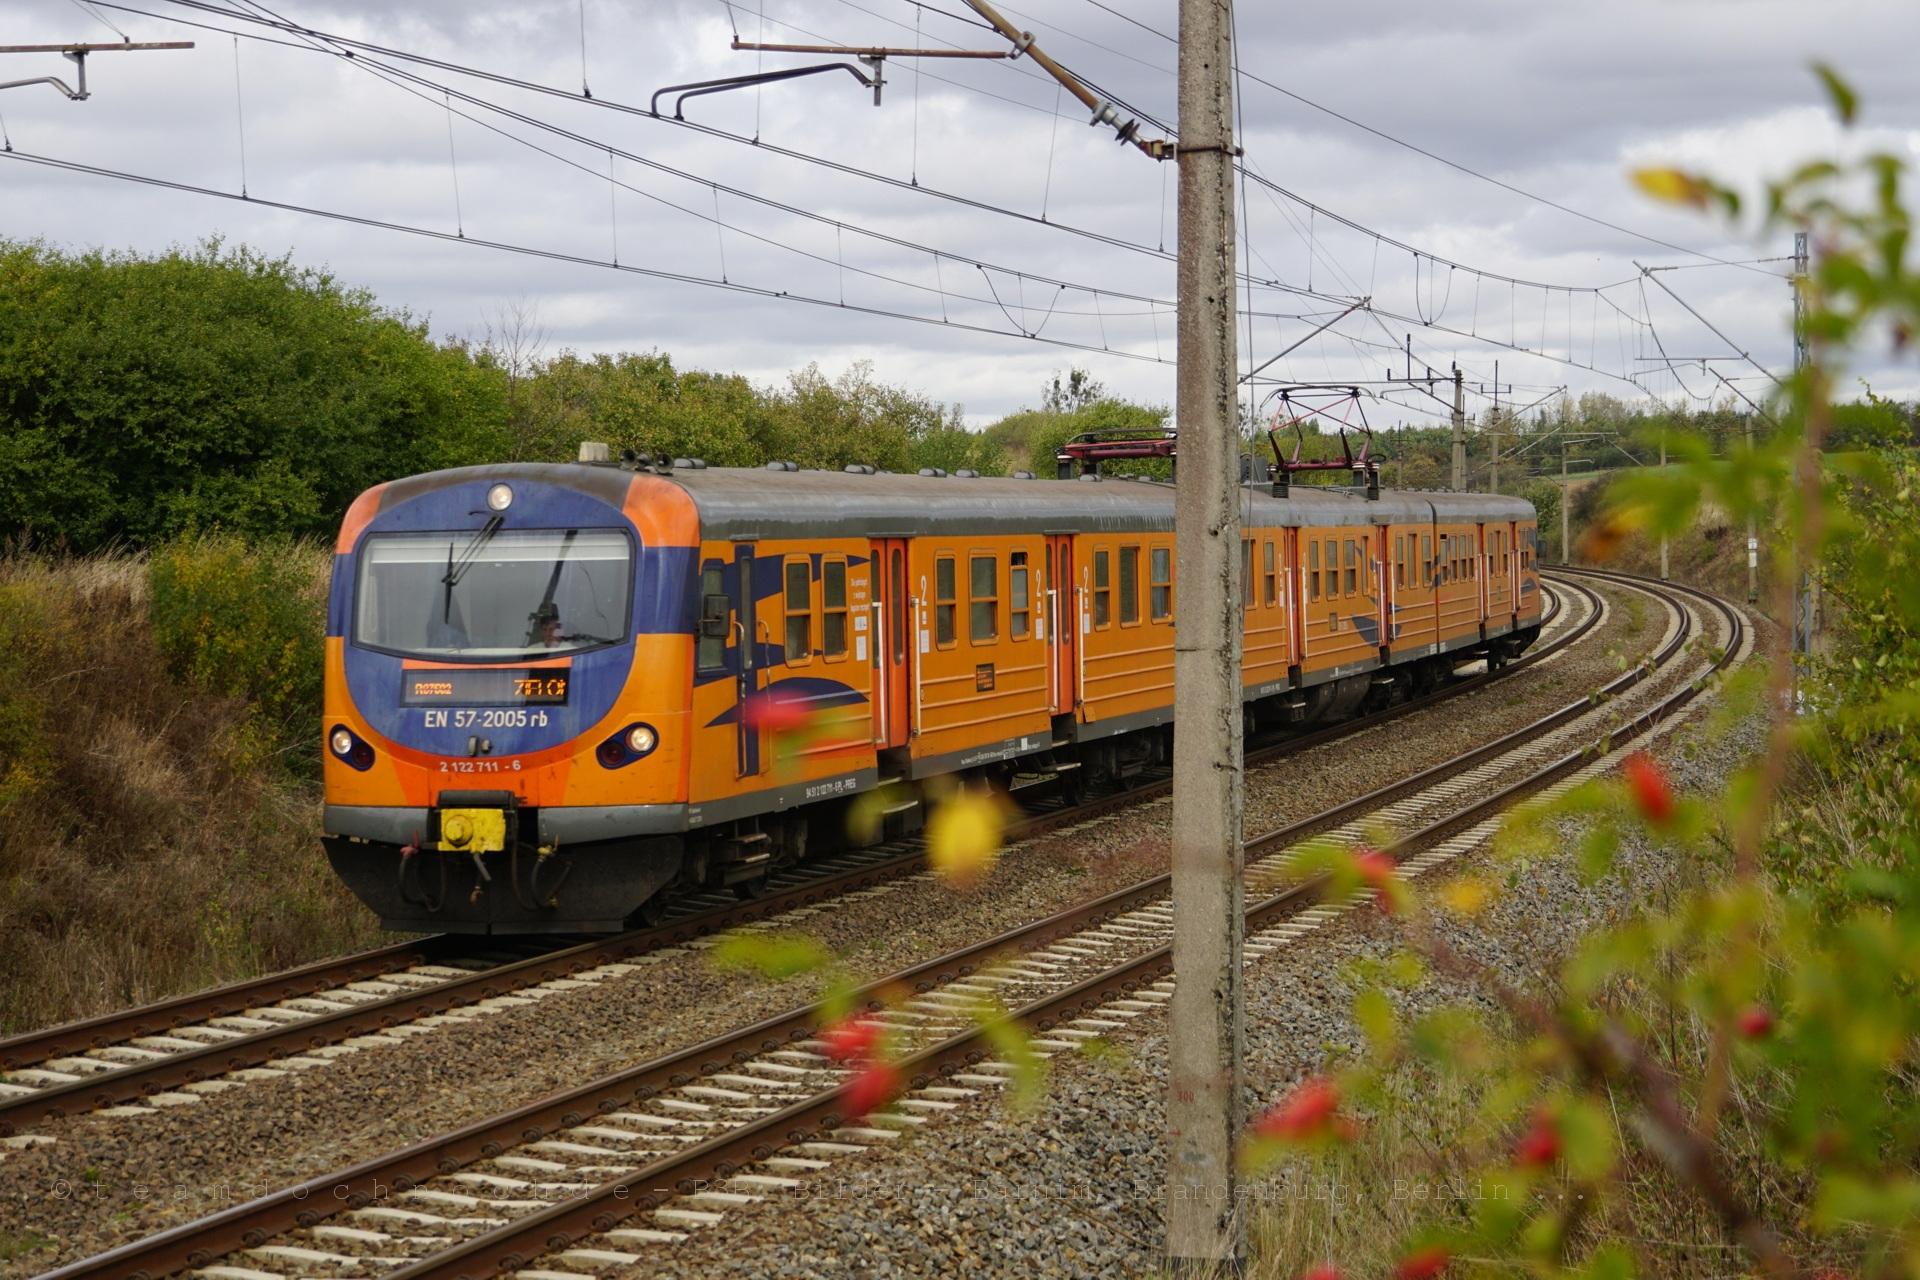 EN 57-2005 auf dem Weg nach Zielona Gora kurz hinter dem Bahnhof Pacholęta